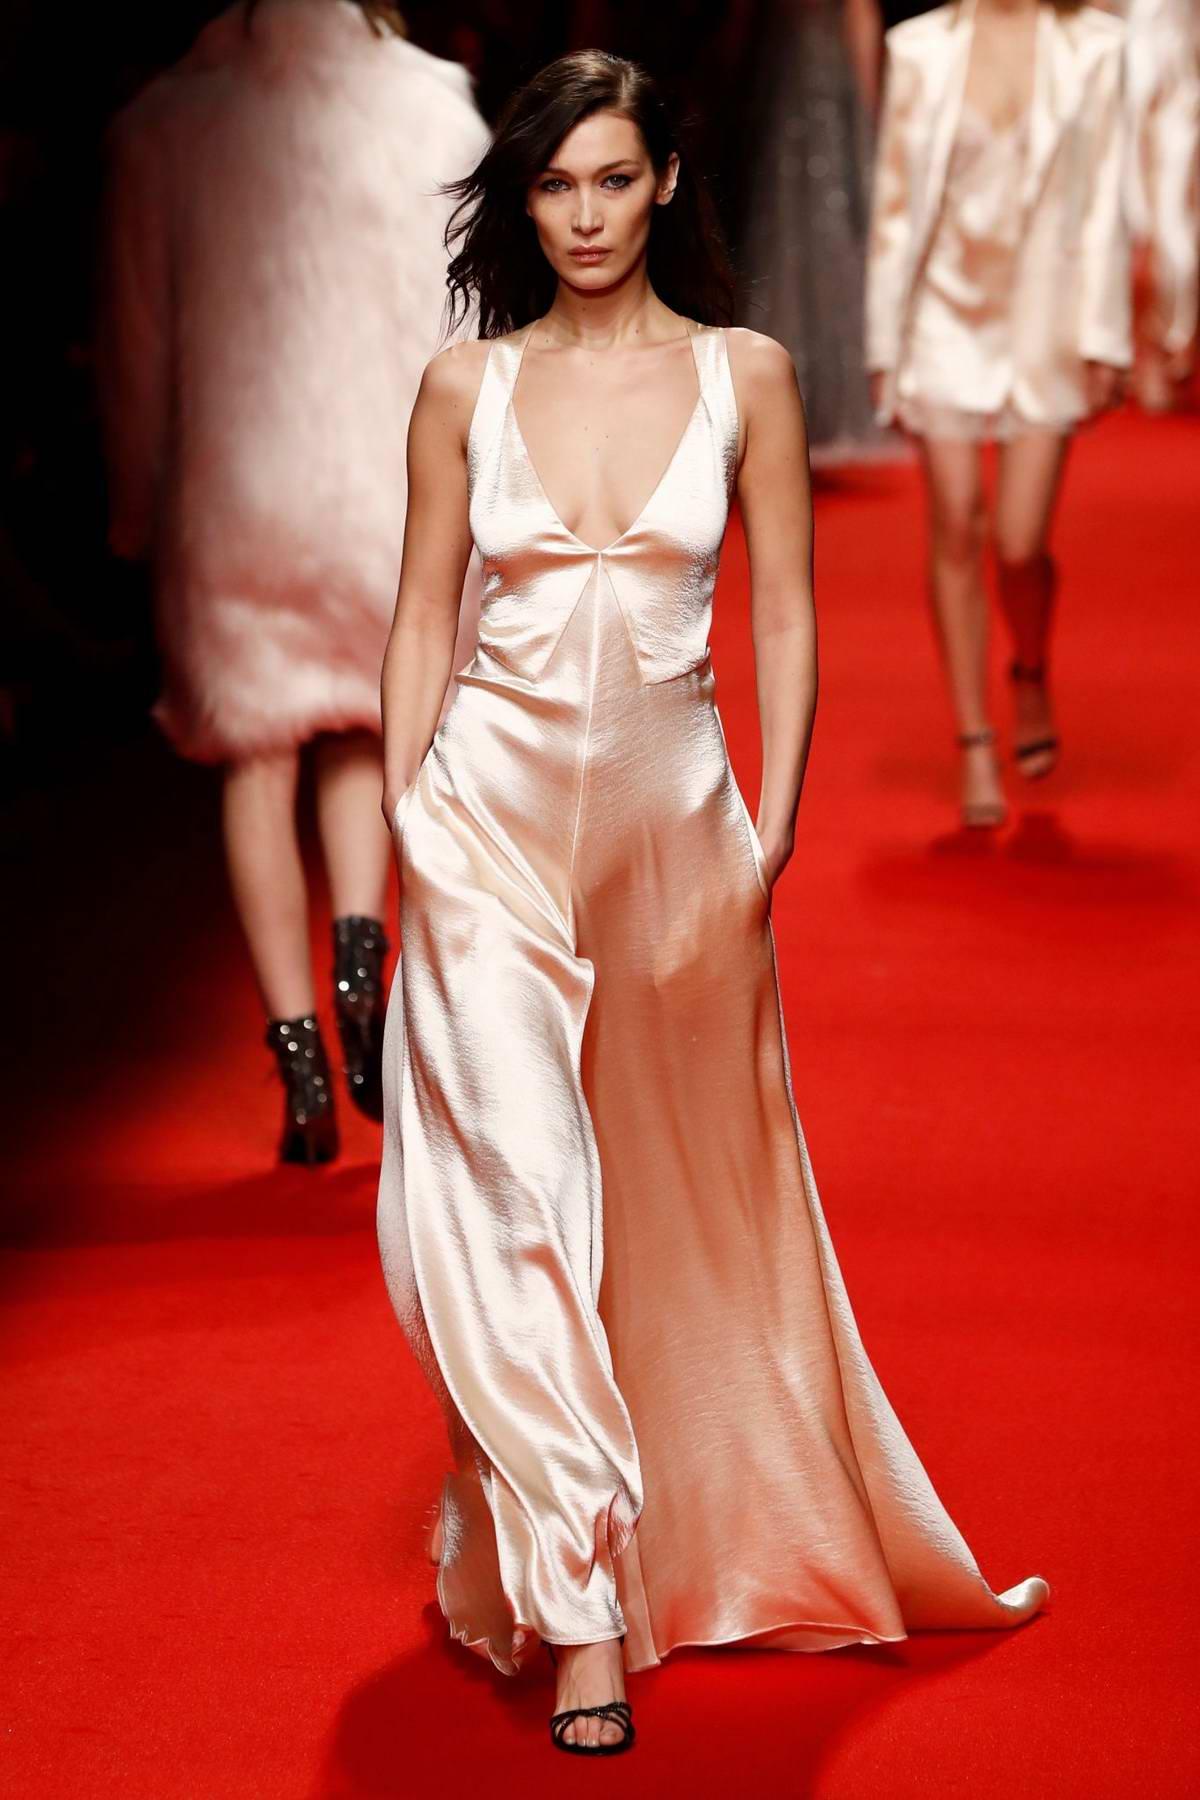 Bella Hadid walks the runways at the Philosophy Di Lorenzo Serafini Fashion Show during Milan Fashion Week in Milan, Italy